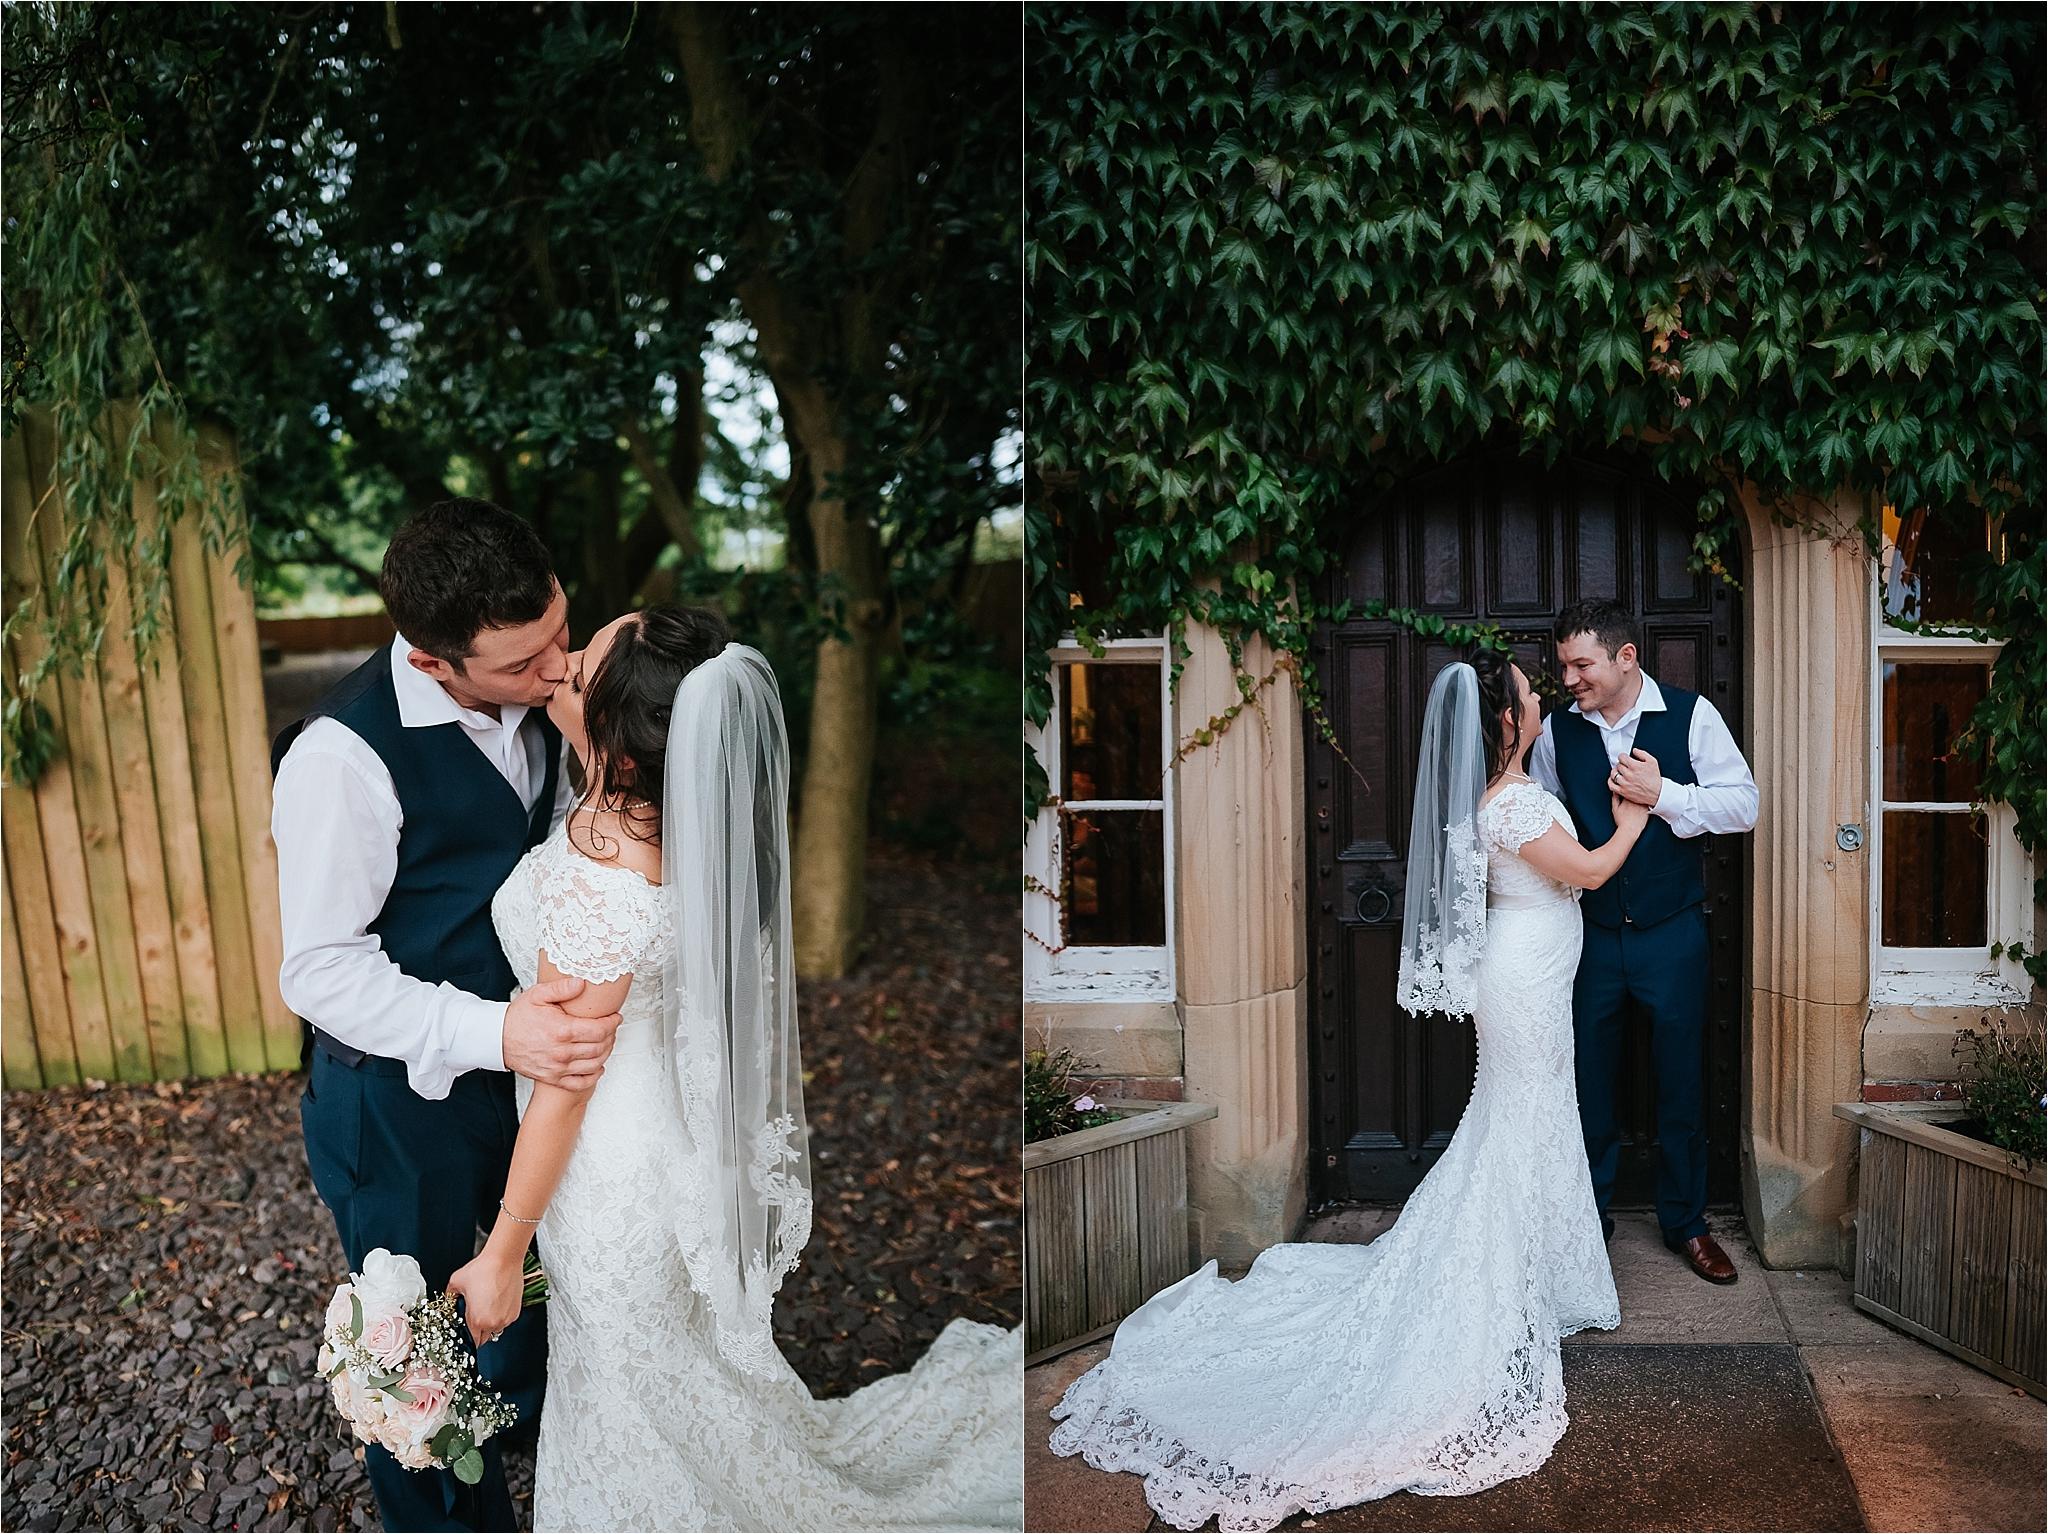 thevilla+lancashire+wreagreen+wedding+photographer108.jpg